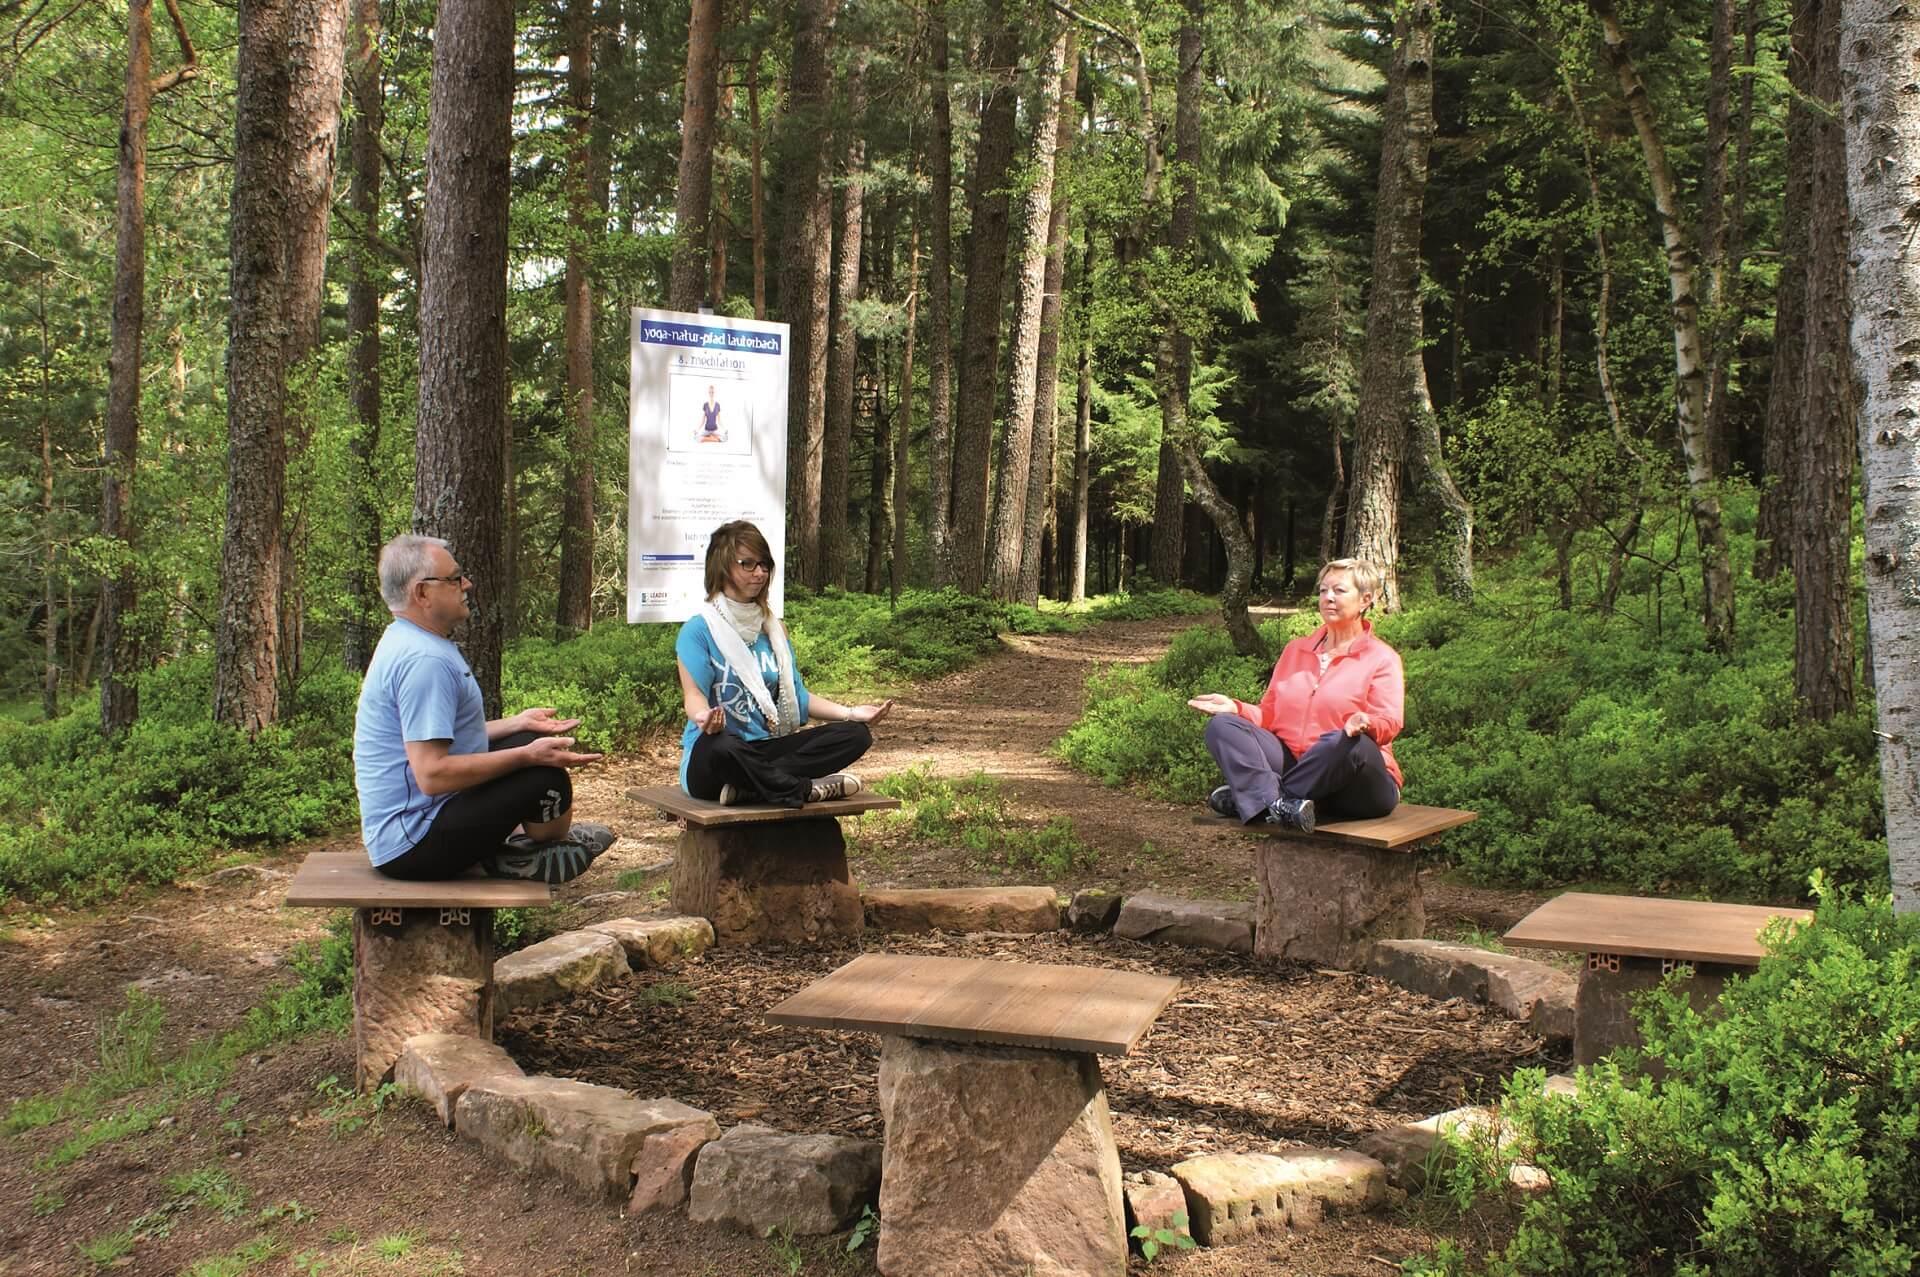 Yogapfad in Lauterbach im Kinzigtal